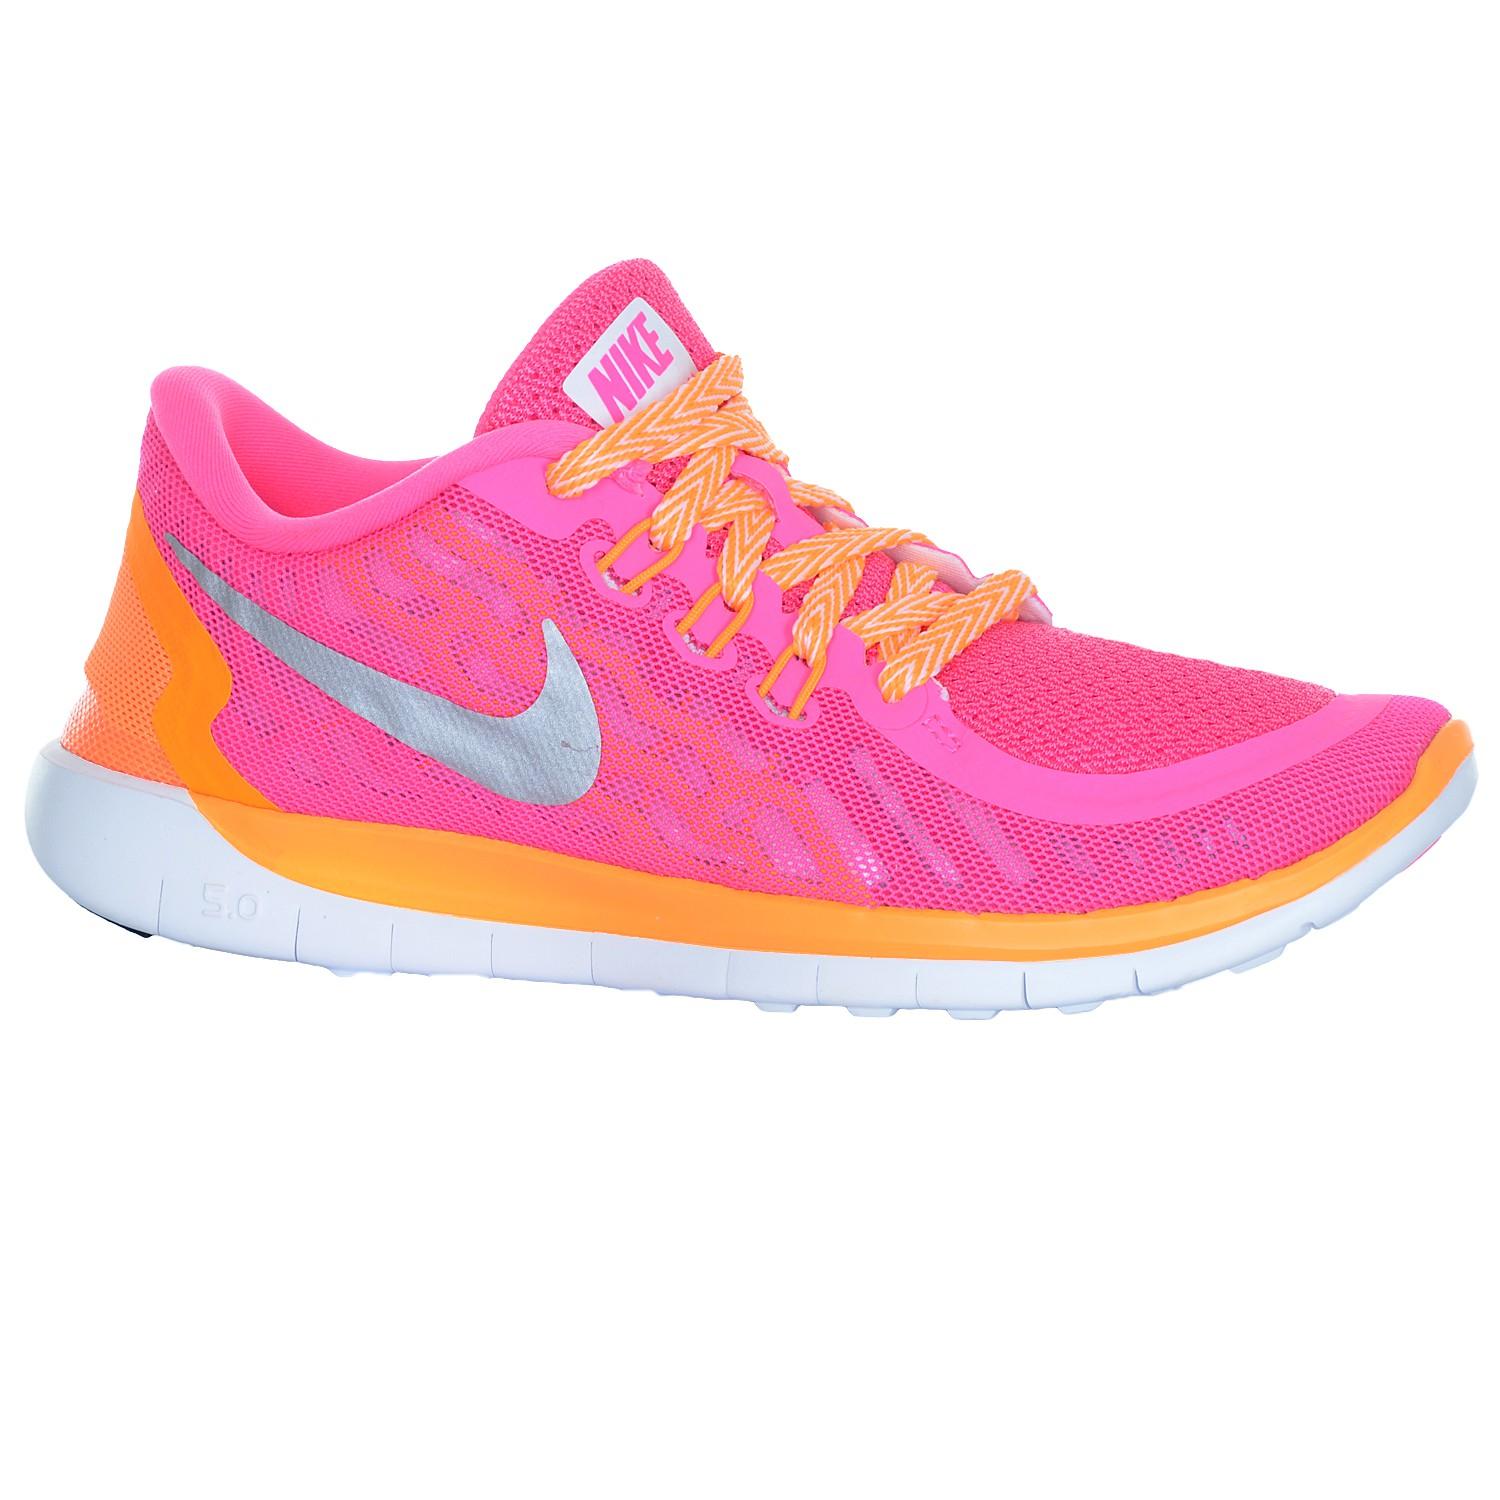 Nike Free 5.0 (GS) Federleichter Mädchen Laufschuh Kindersportschuh Pink Power Kids Schuhe Laufschuhe